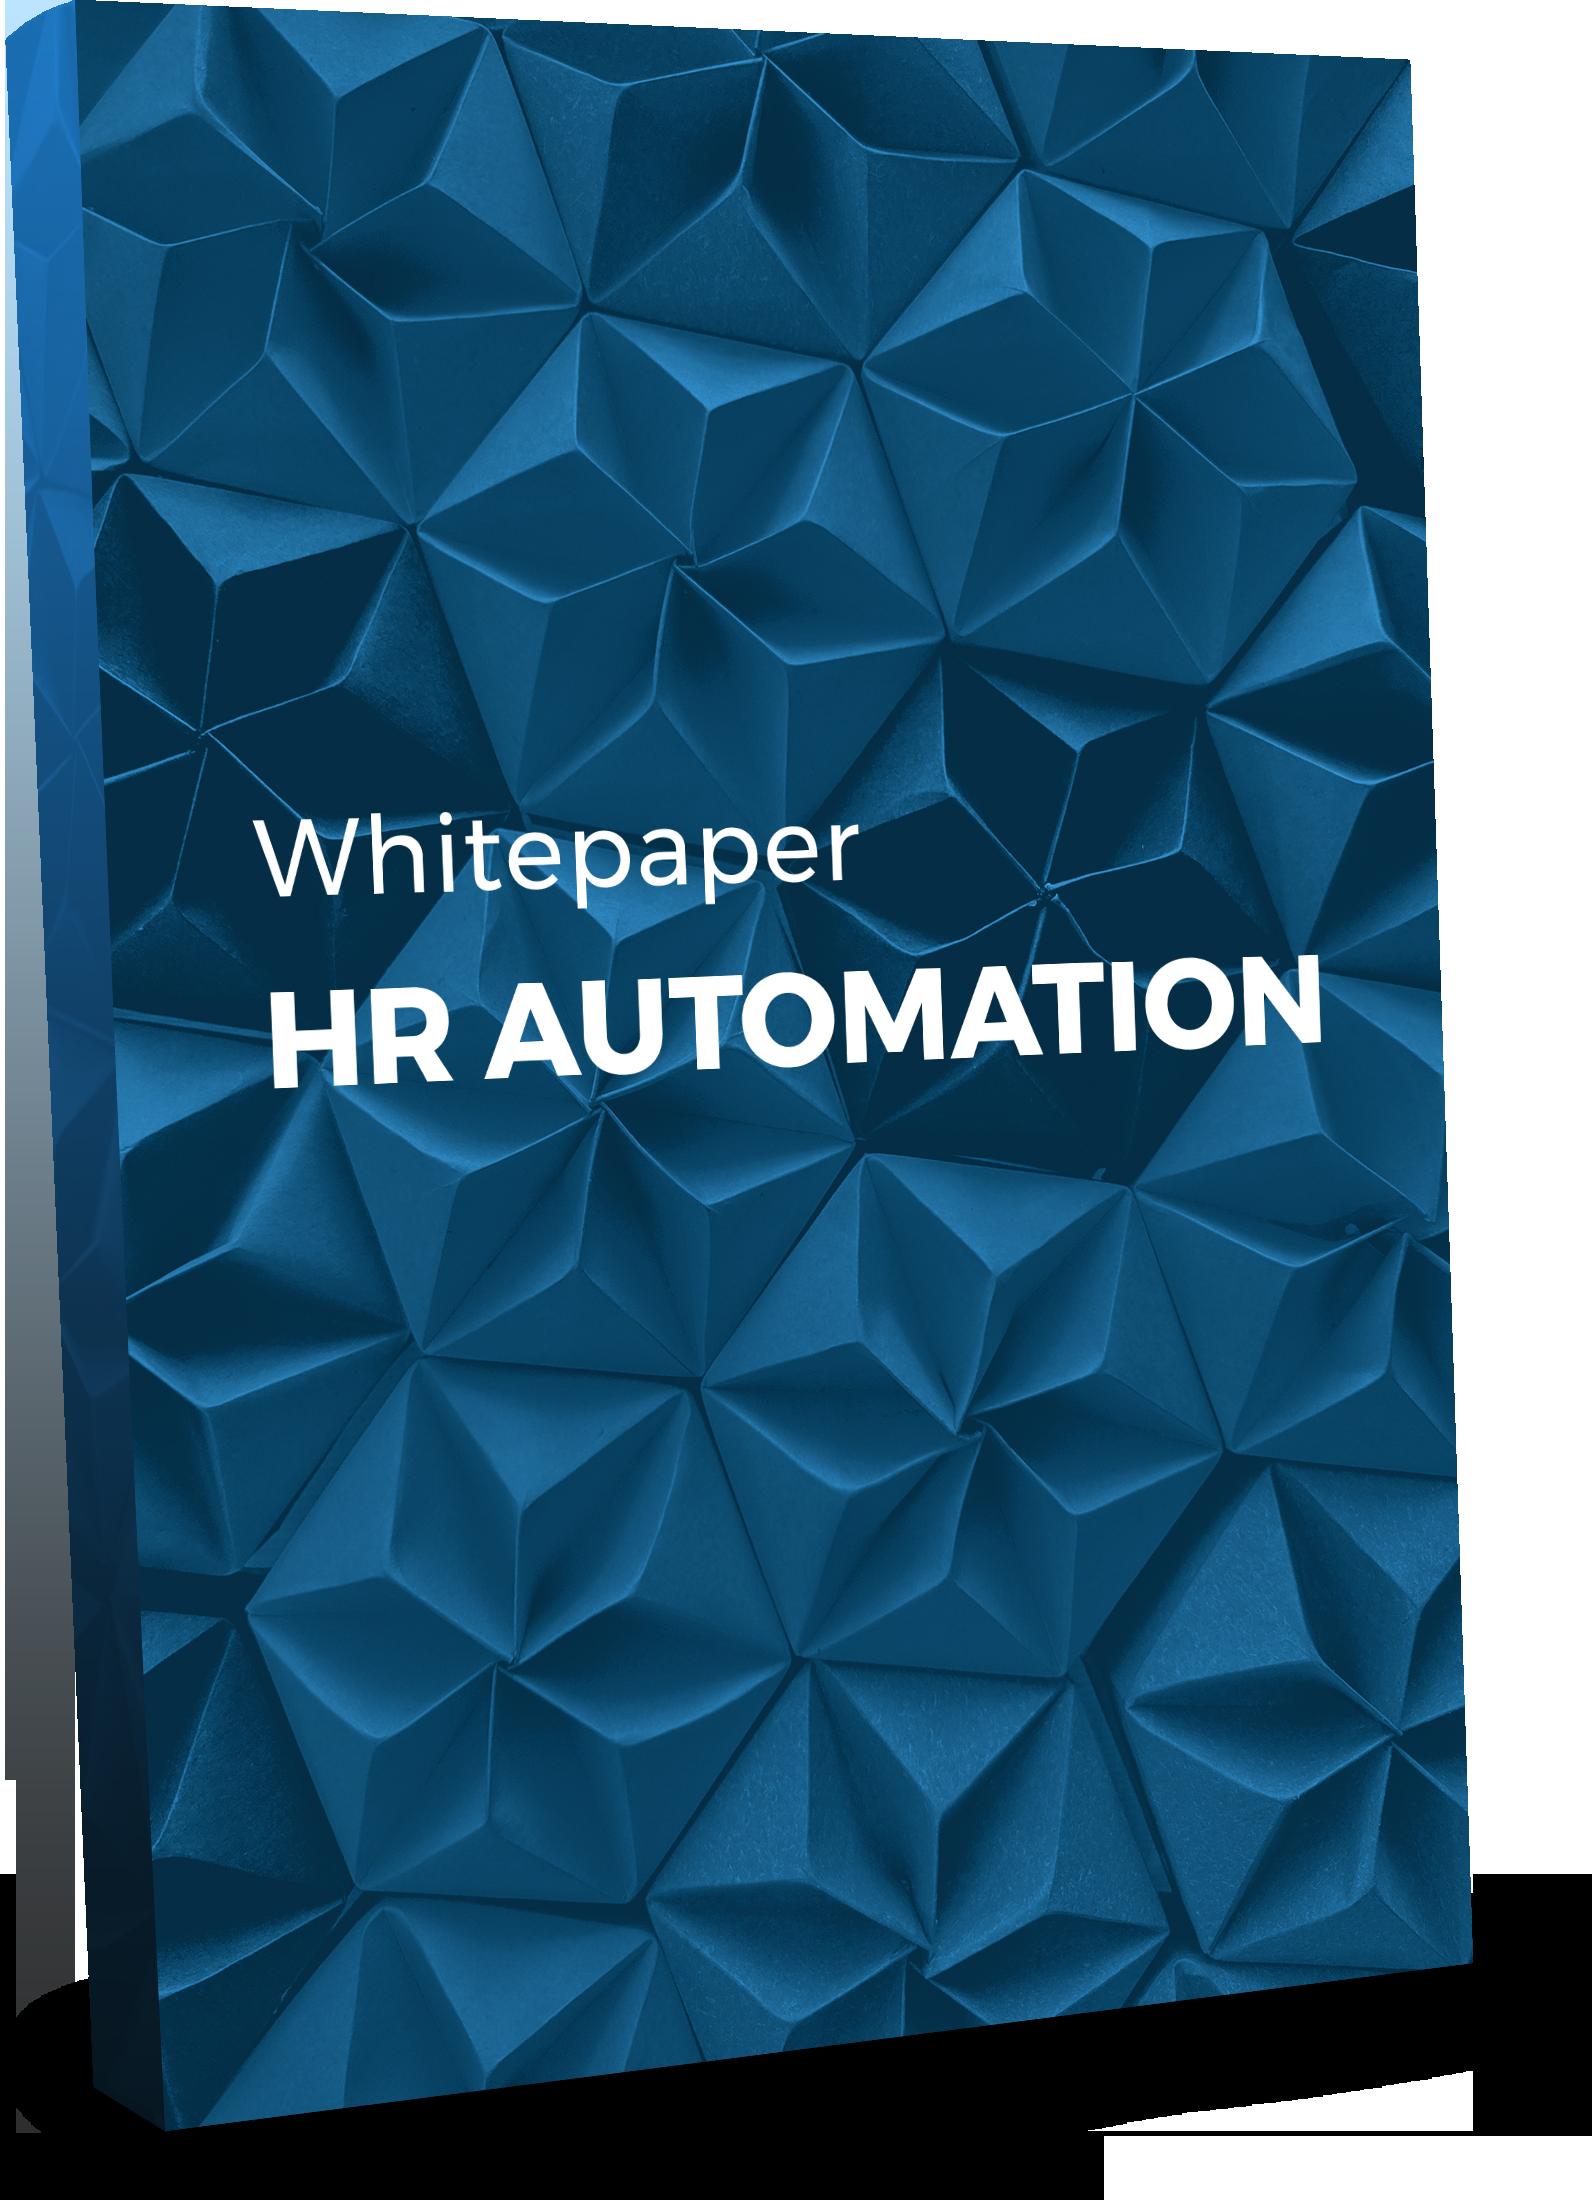 whitepaper-hr-automation